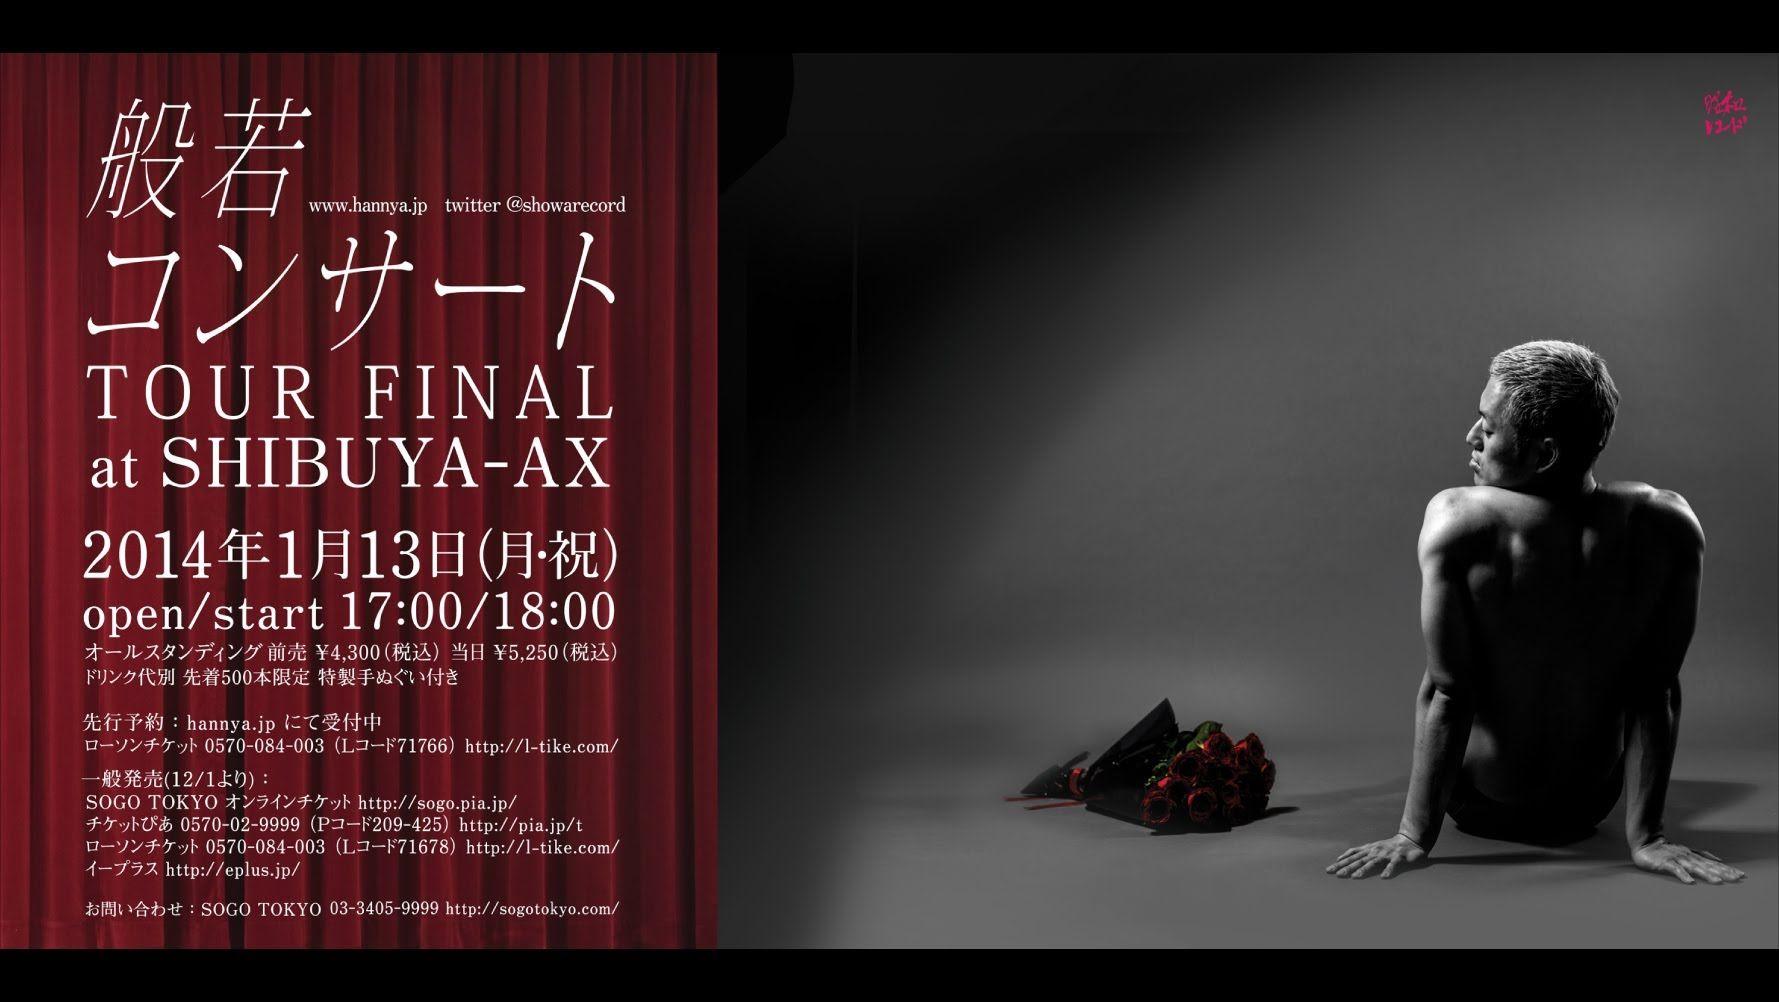 【Official Music Video】般若 / ジレンマ feat. MACCHO(OZROSAURUS) (P)(C)昭和レコード 2013